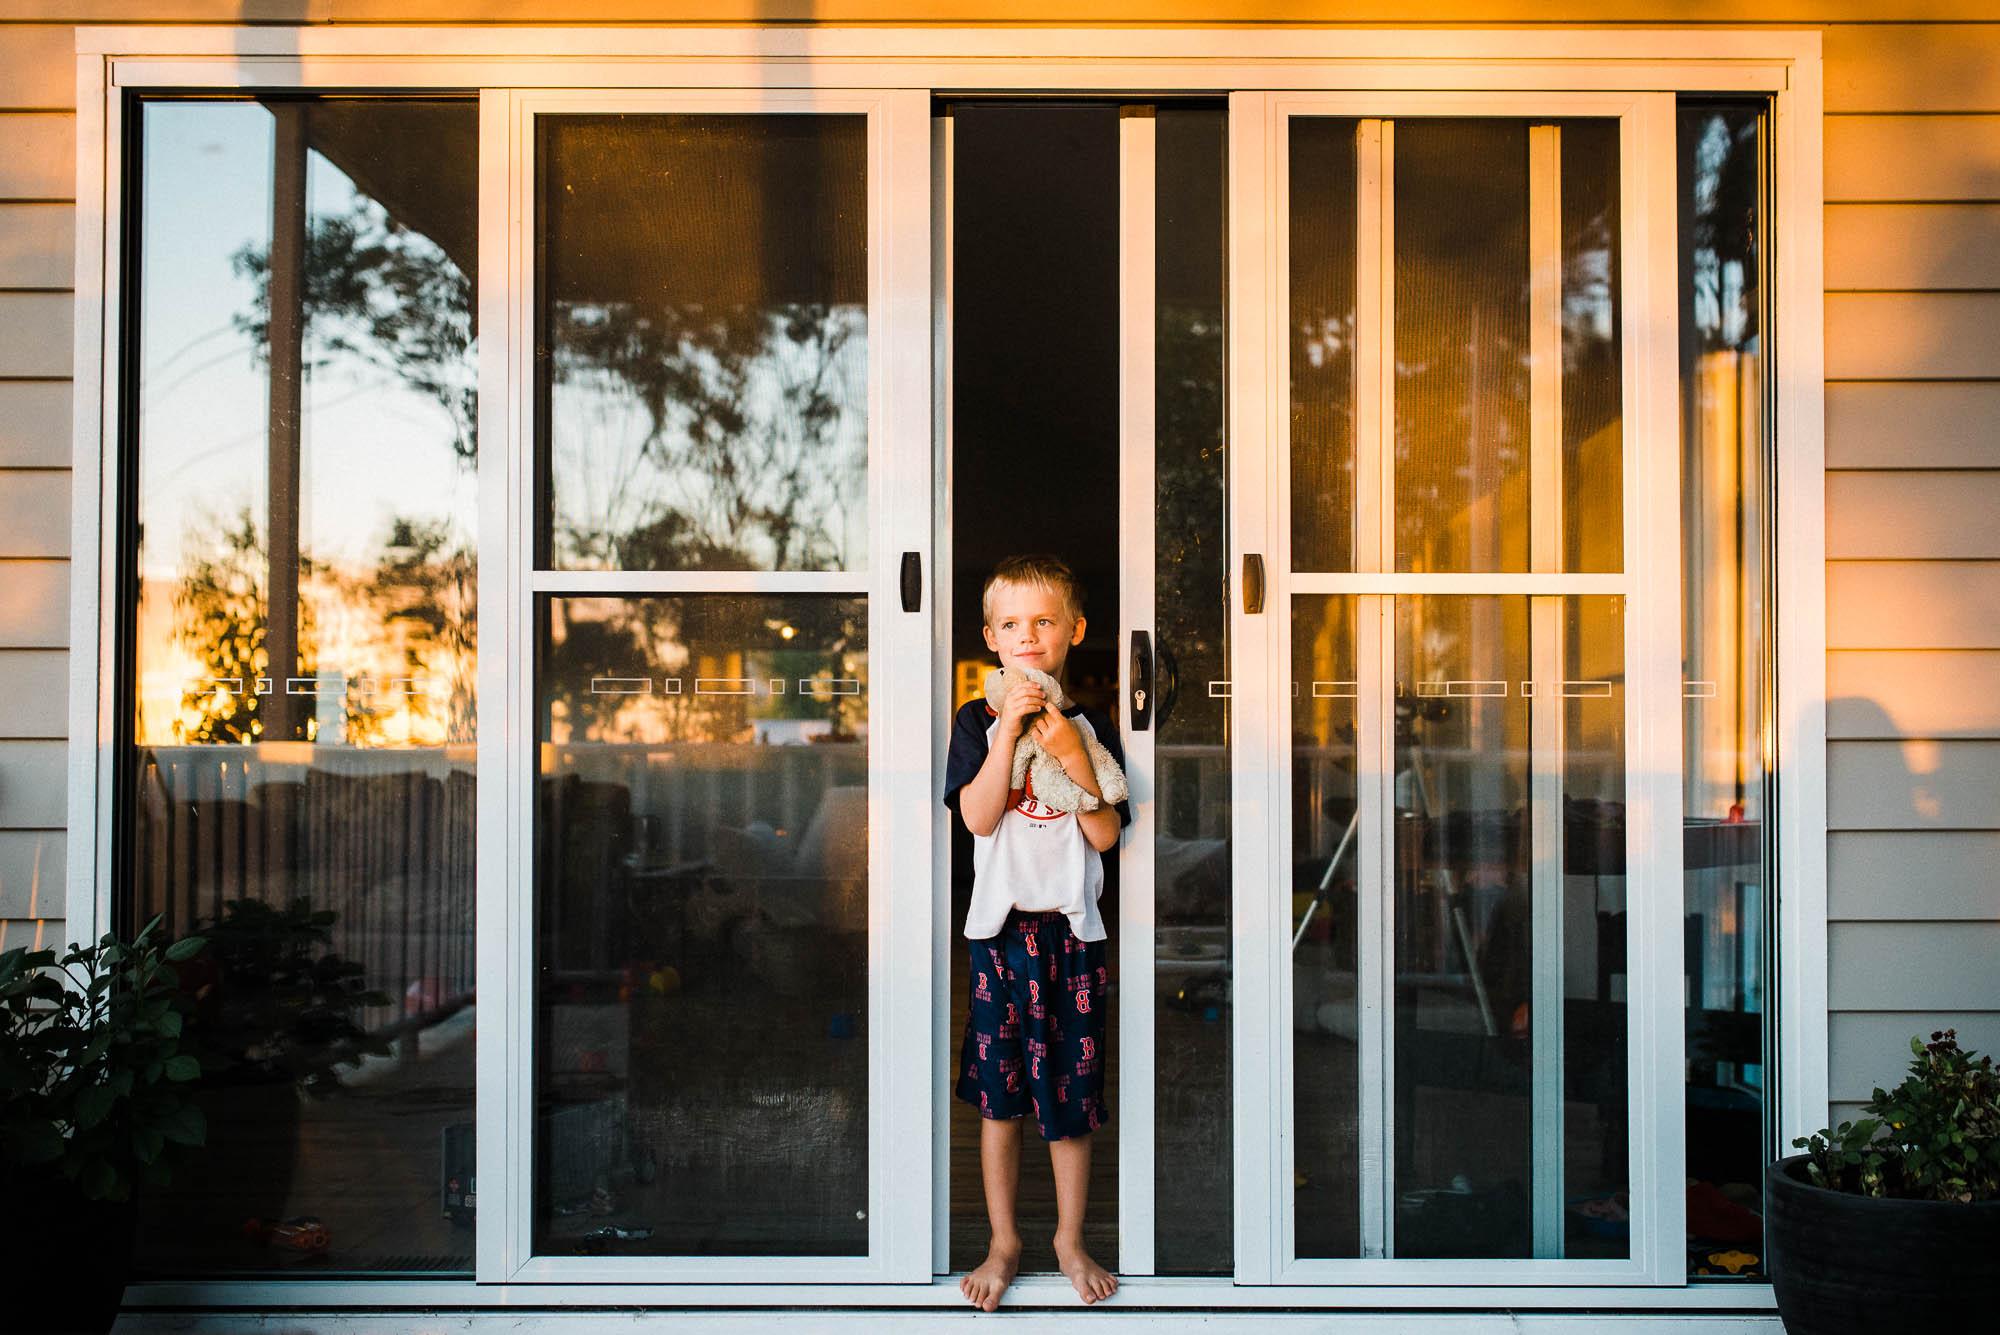 melbourne_family_photographer_boy_in_doorframe_at_sunrise.jpg